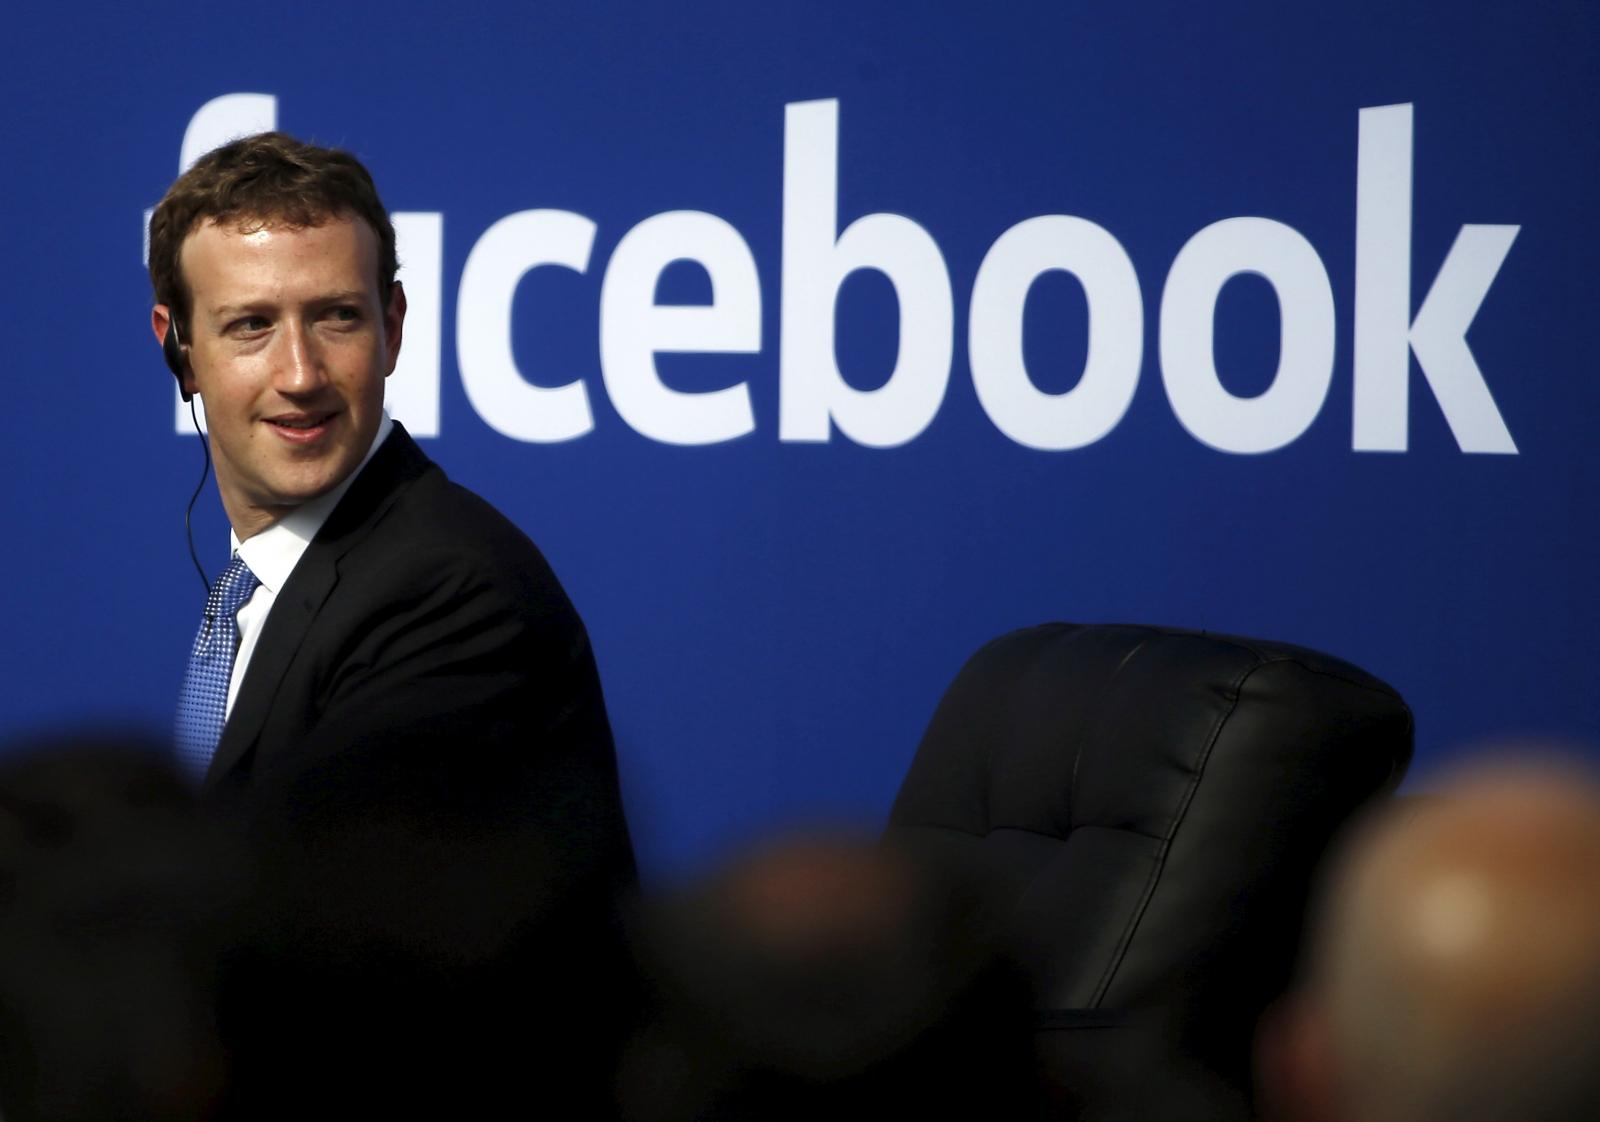 Facebook Mark Zuckerberg on Donald Trump